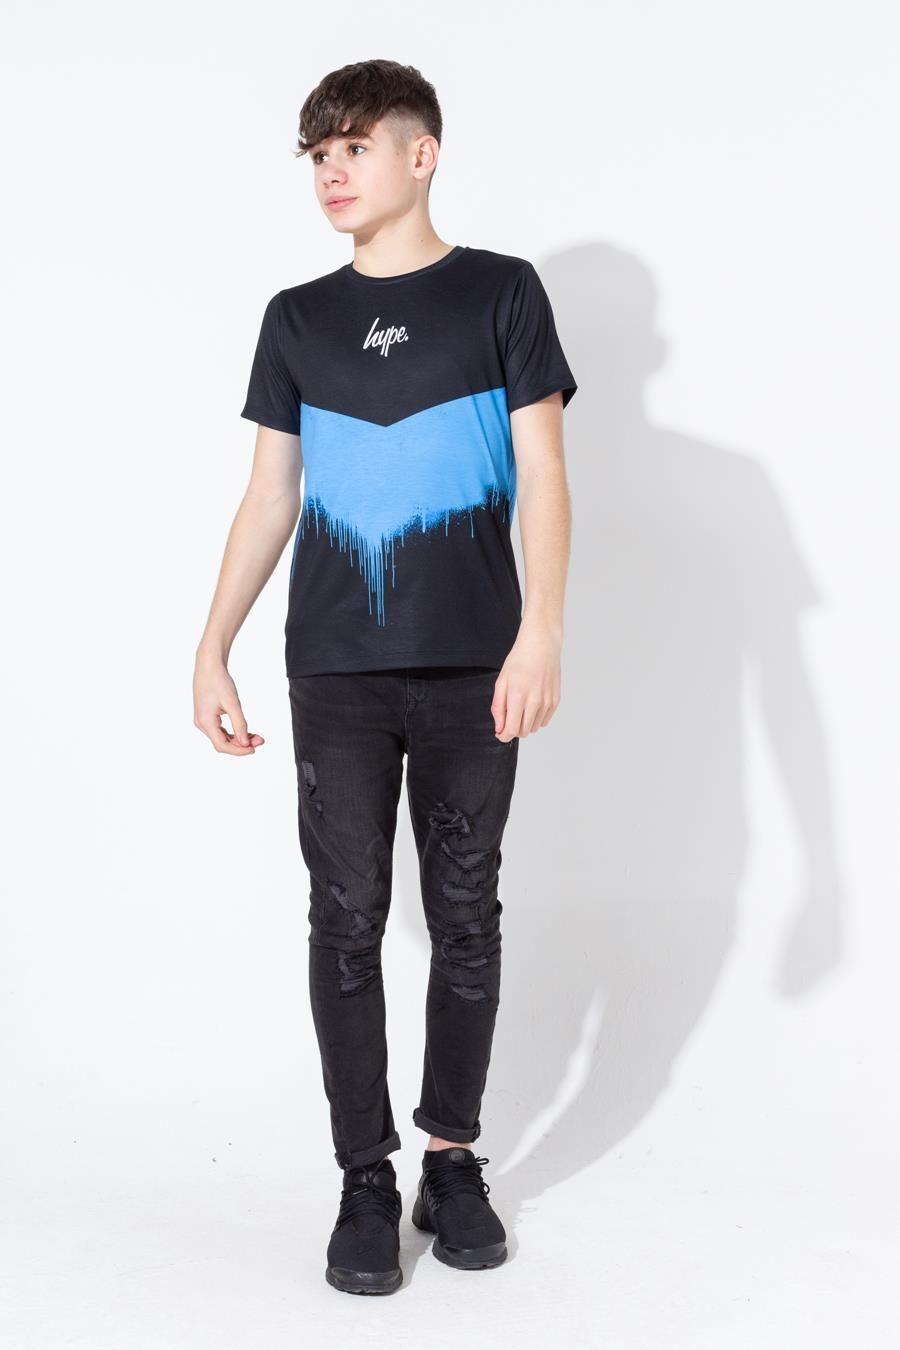 Hype Blue Chevron Drips Kids T-Shirt